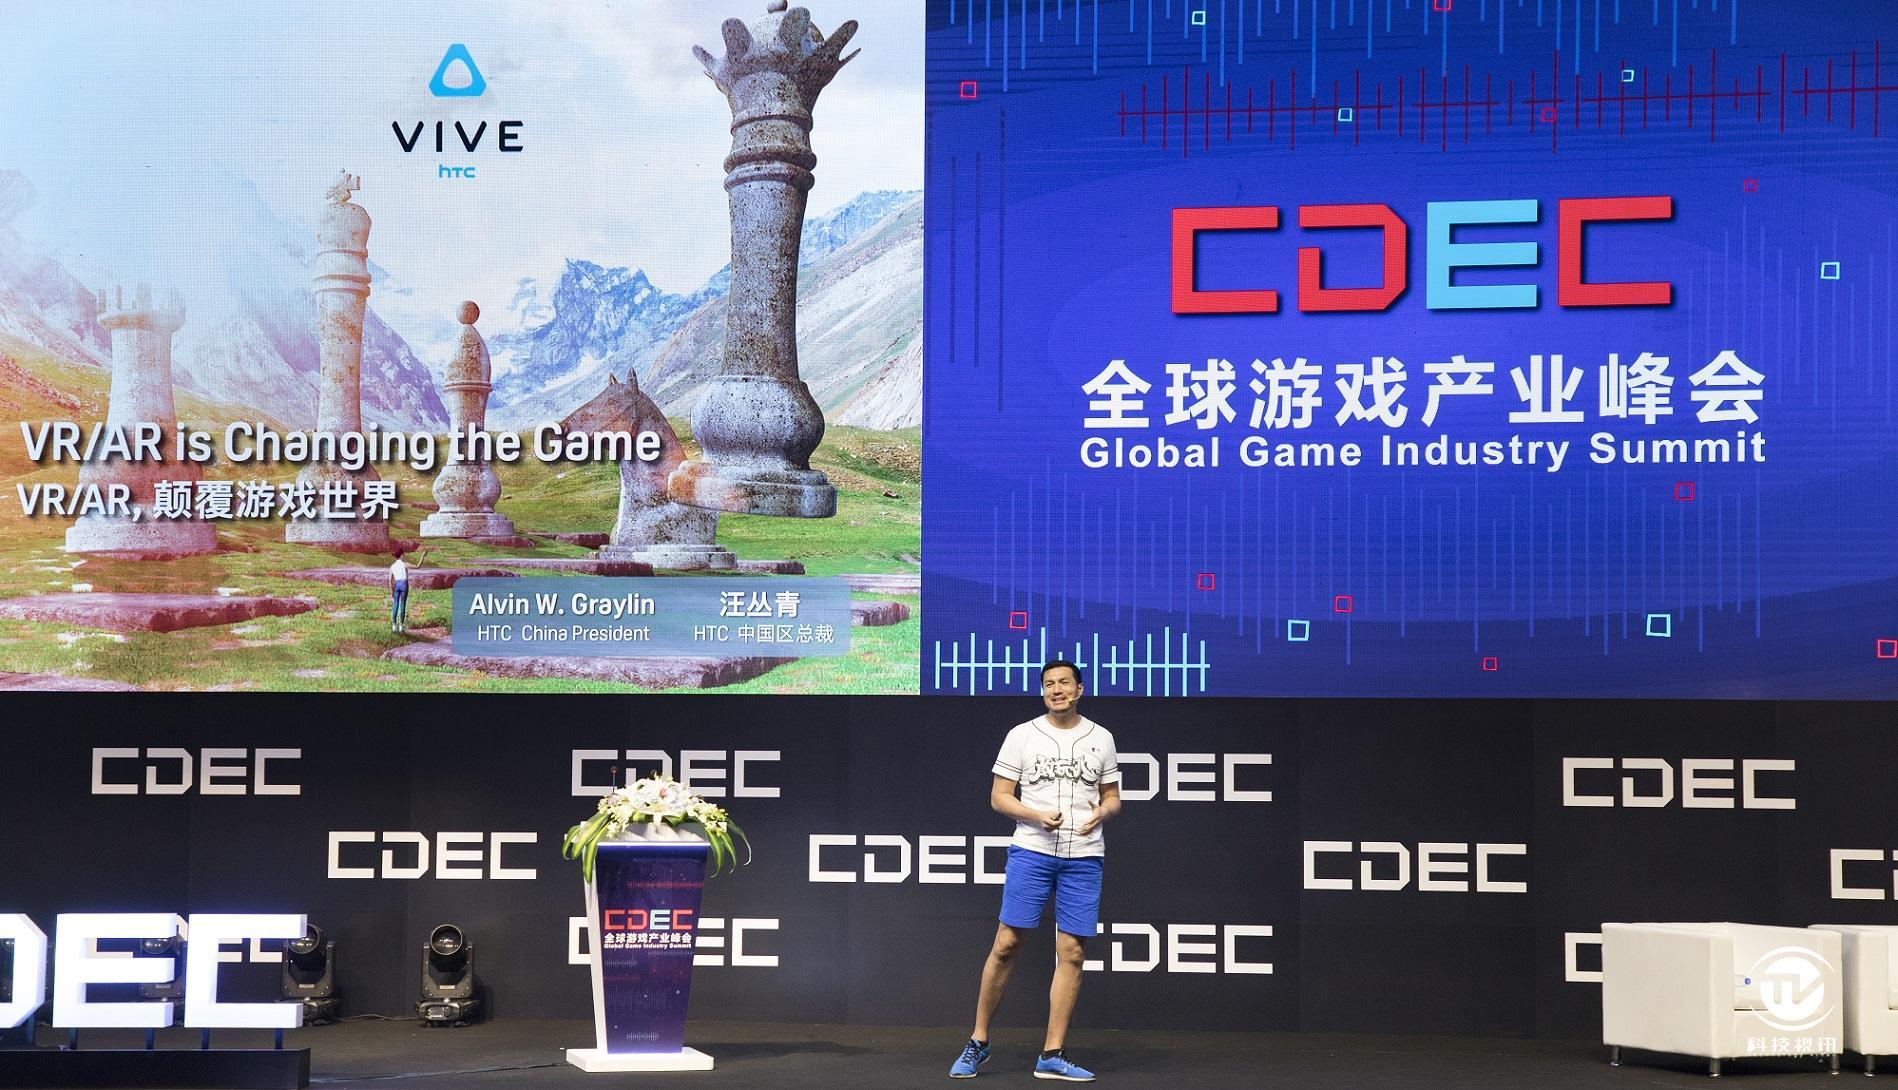 HTC中国区总裁汪丛青在ChinaJoy 2018发表主题演讲.jpg